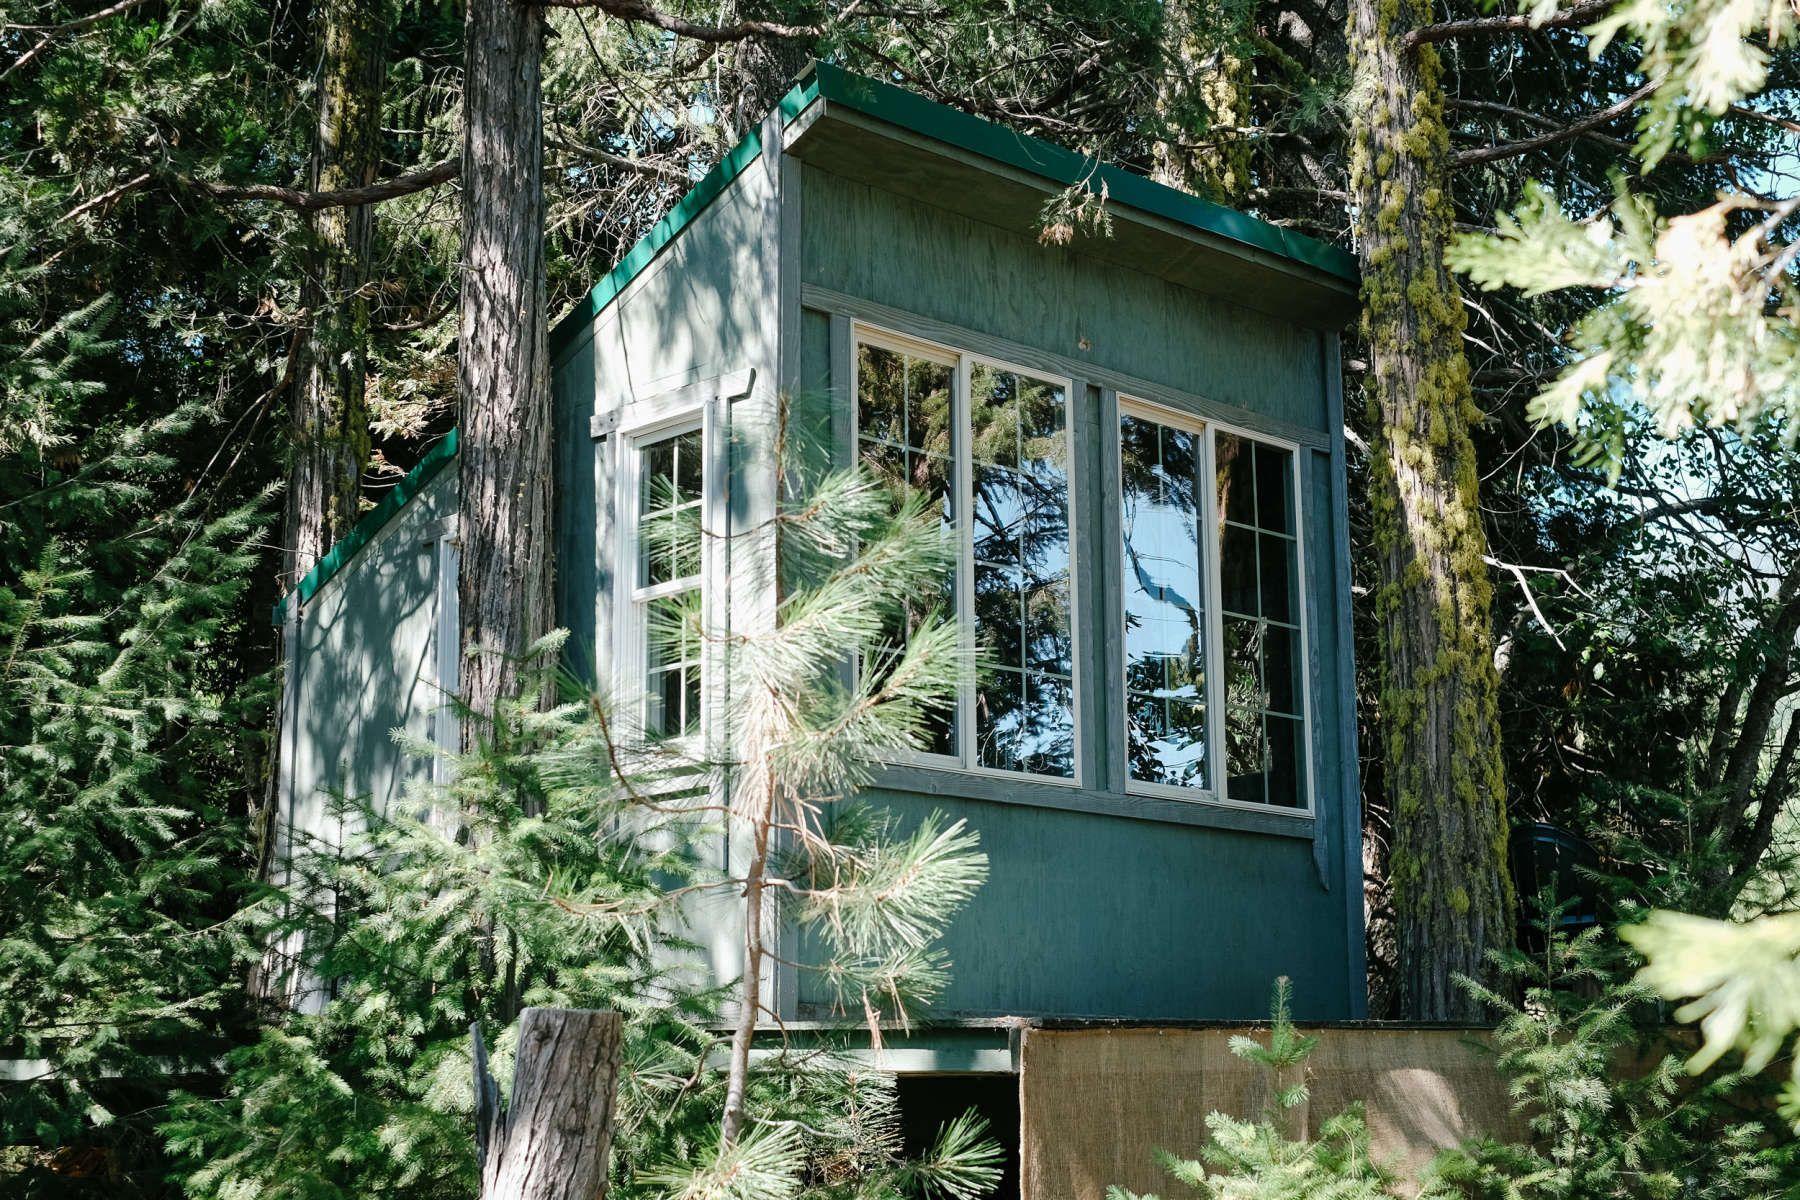 Shasta View Treehouse